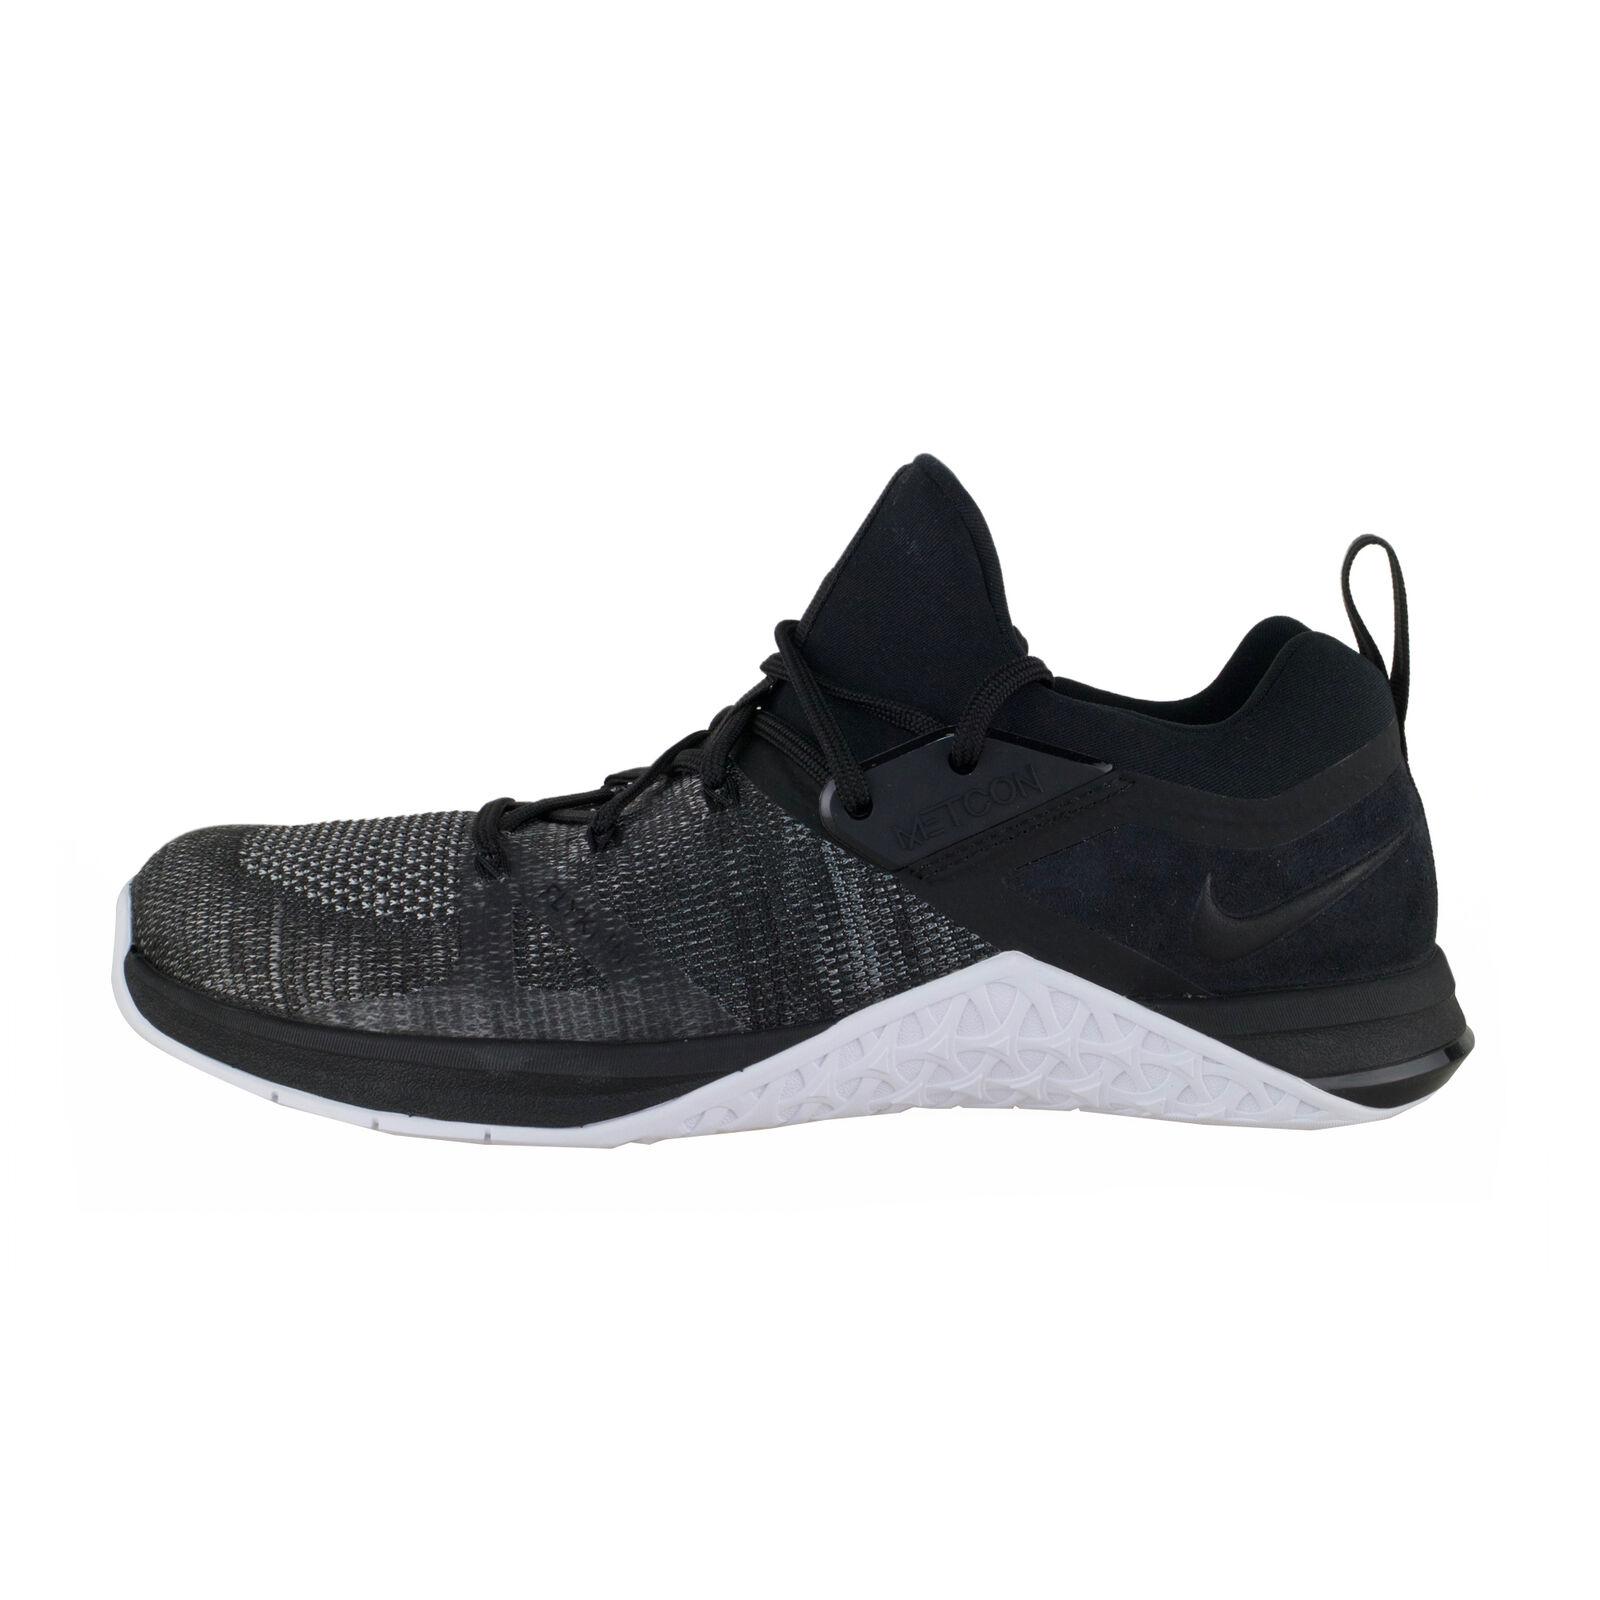 Nike Metcon Flyknit 3 Negro blancoo AQ8022-001